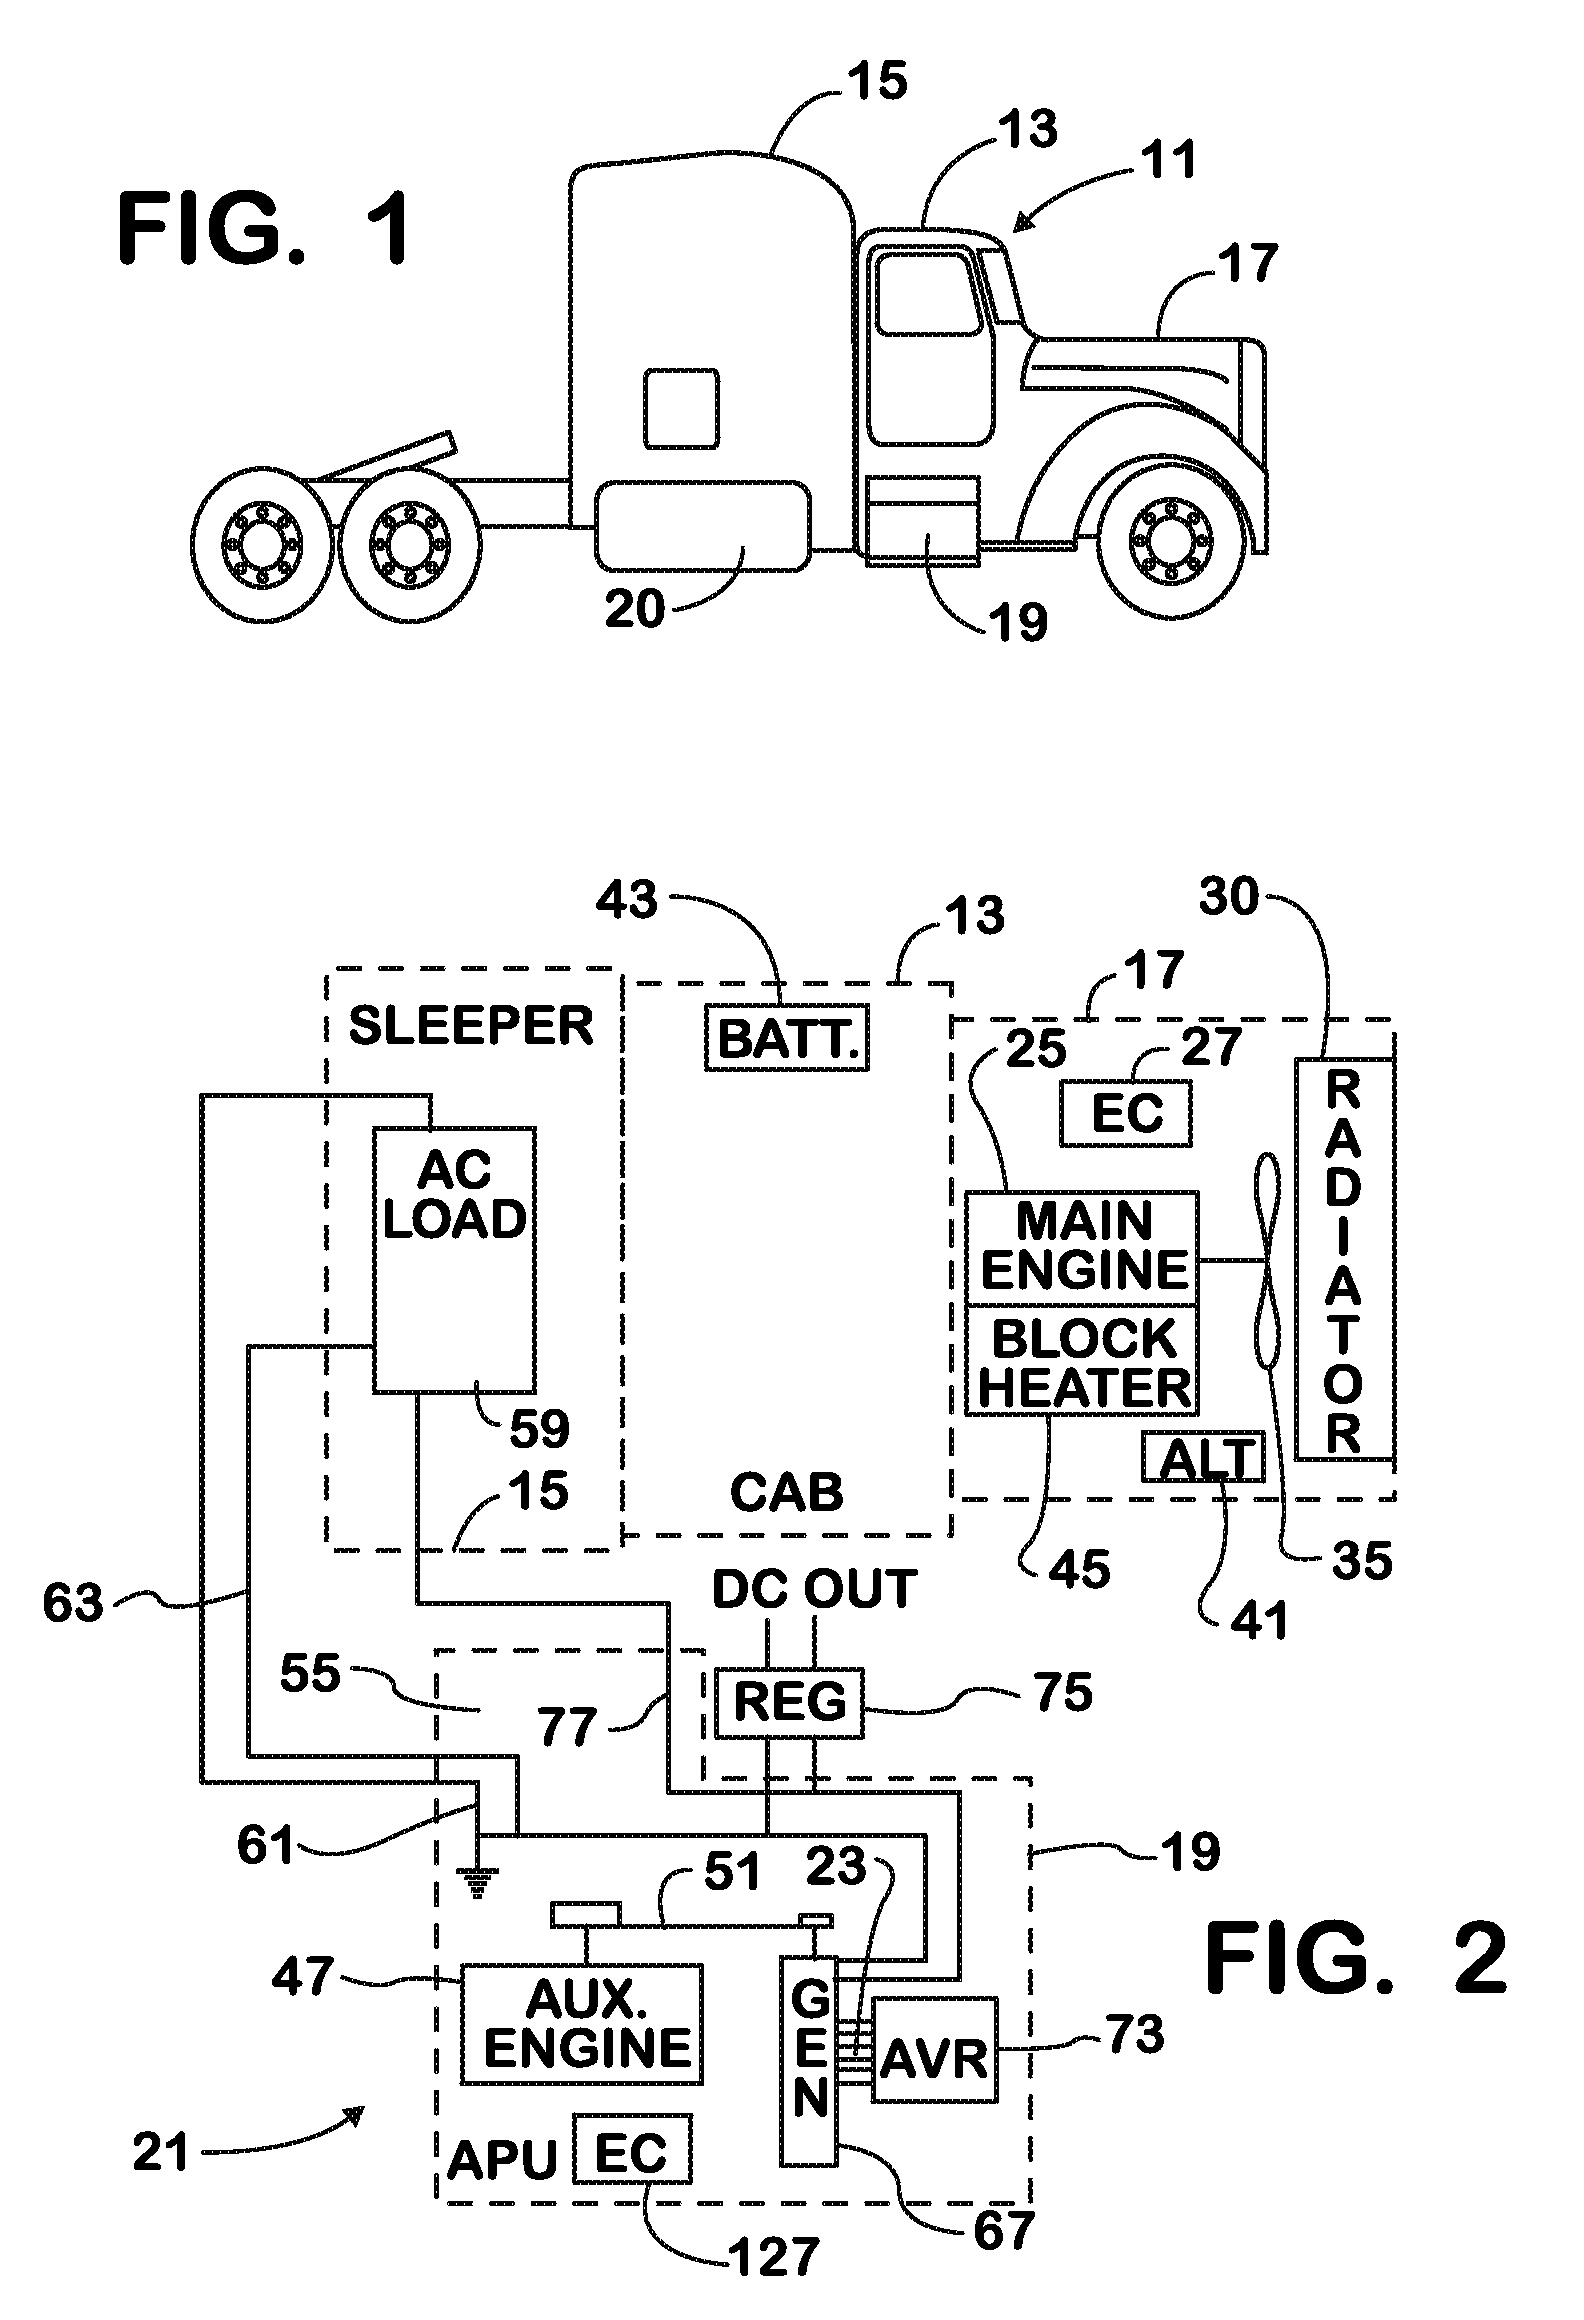 alternator winding diagram including alternator stator winding